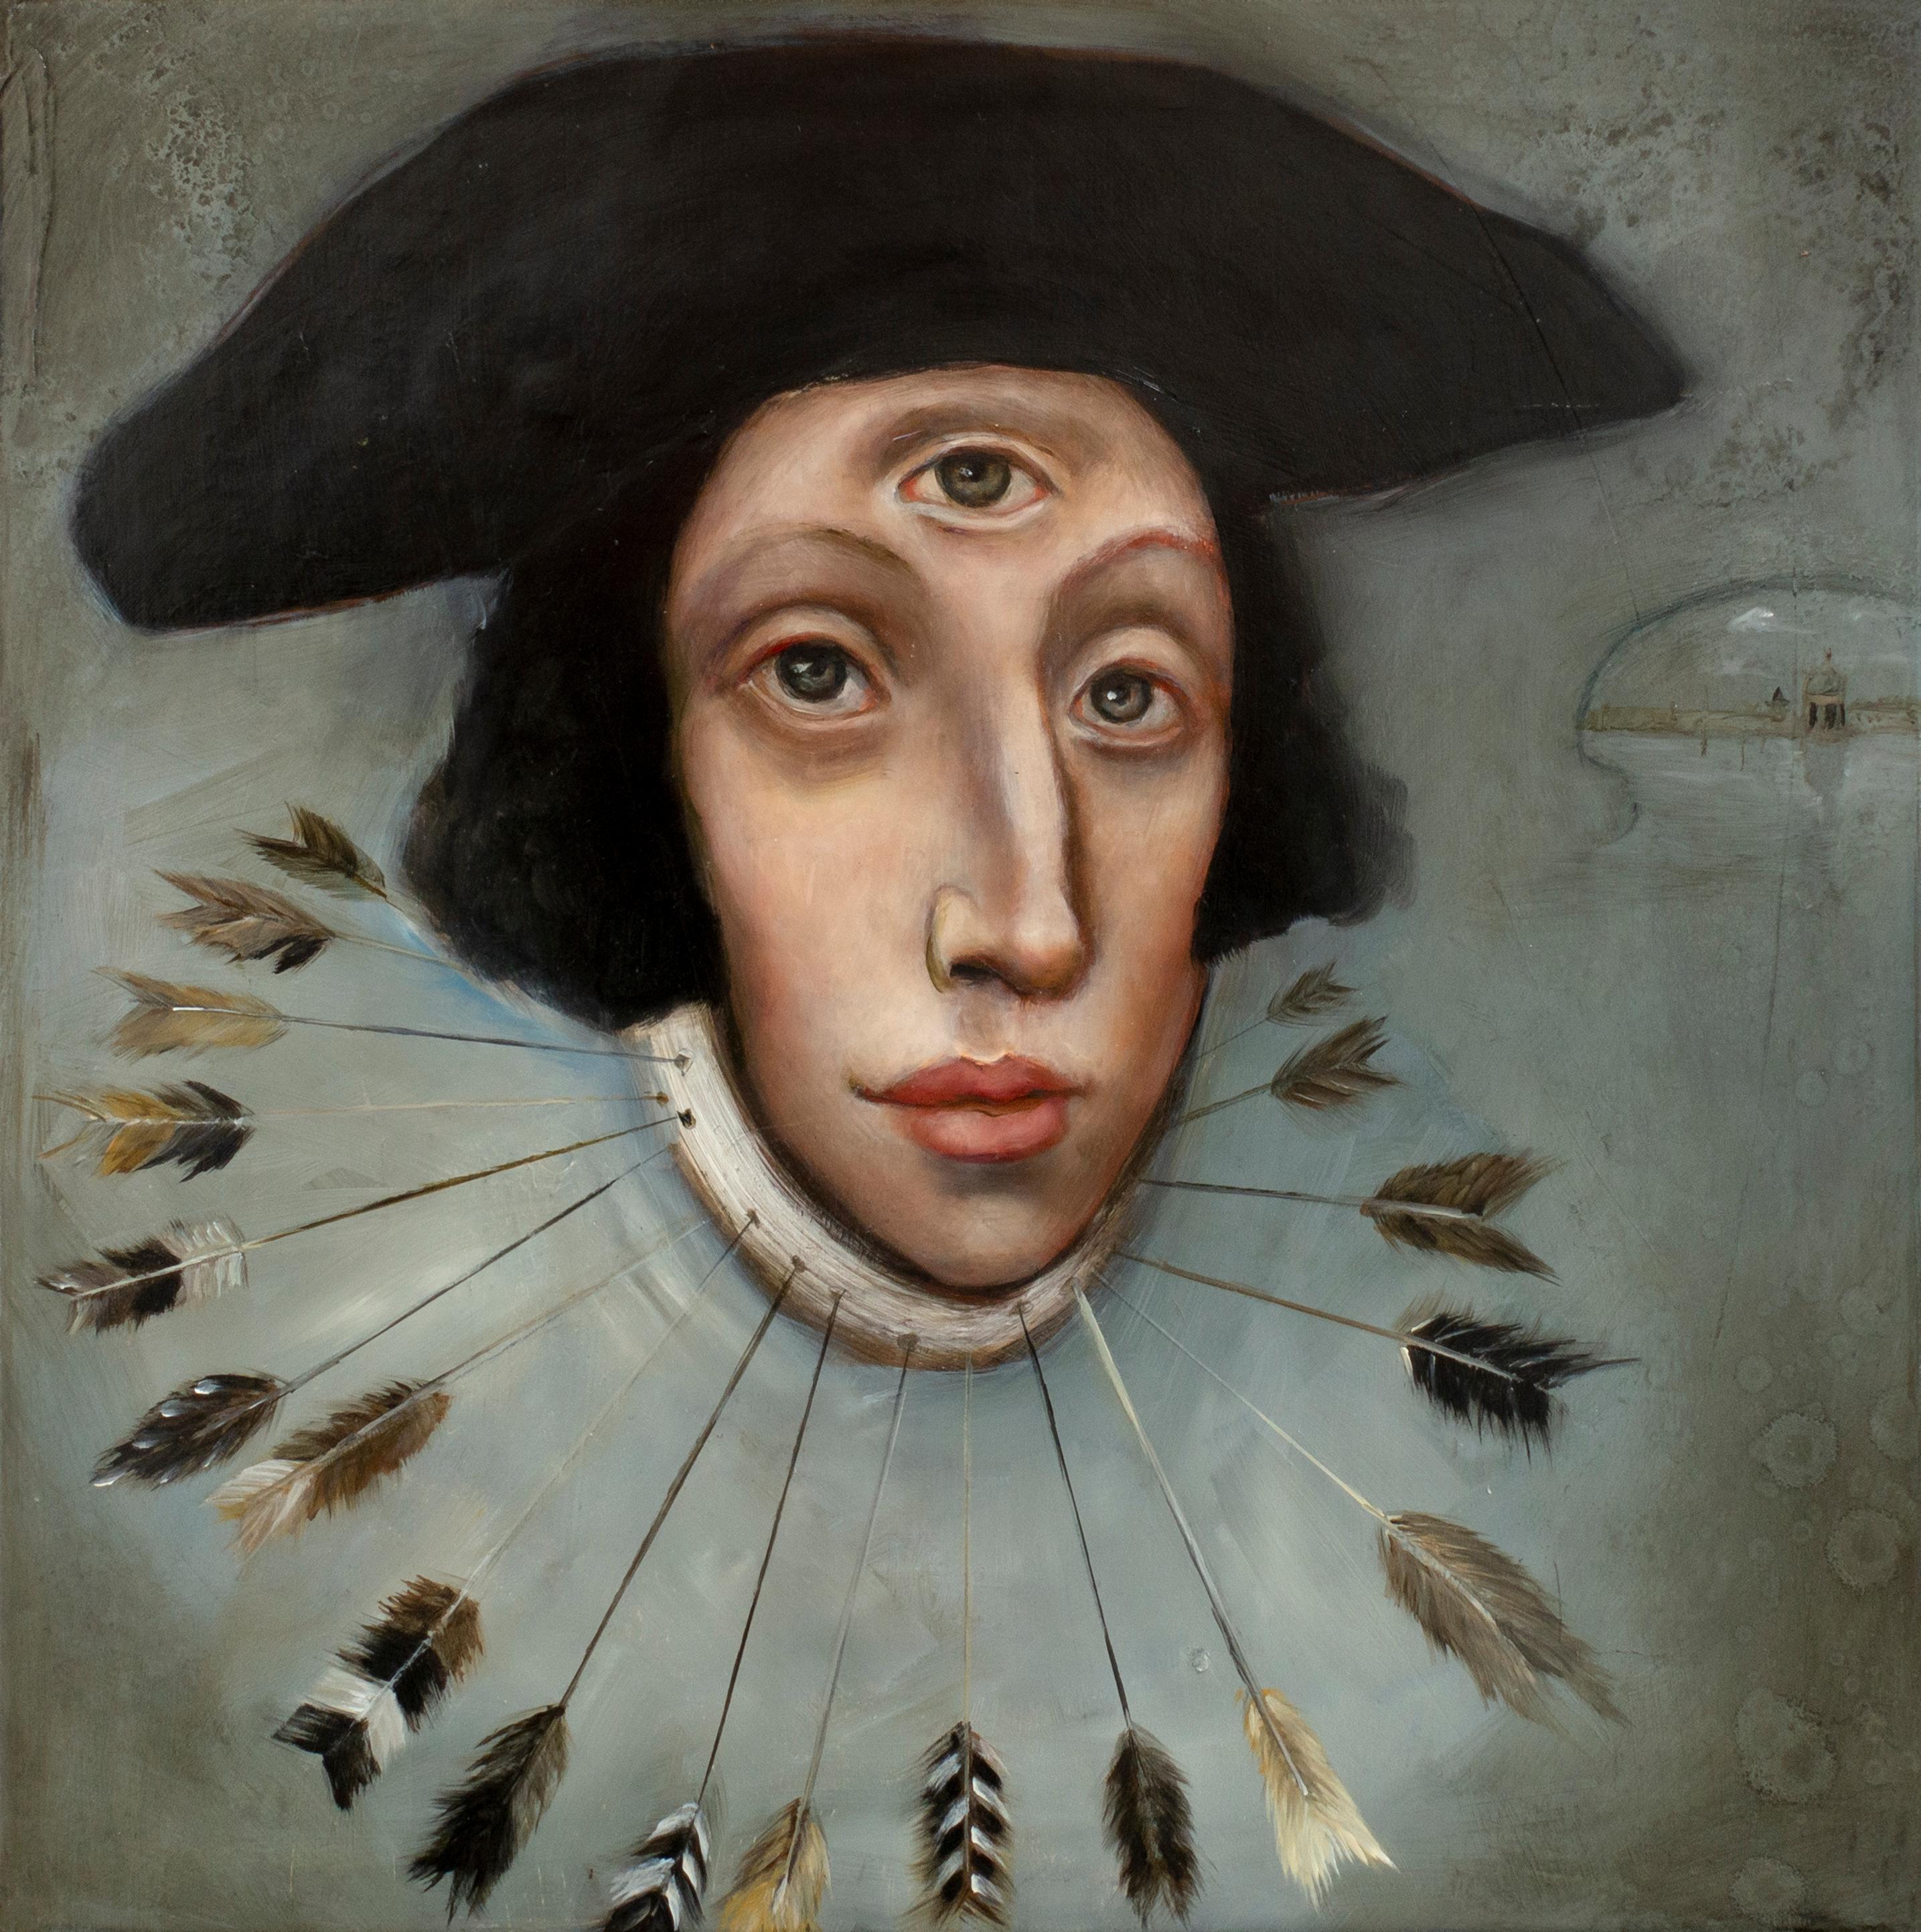 """Saint Edmund"", Oil on canvas, mysterious and whimsical pop art portrait"